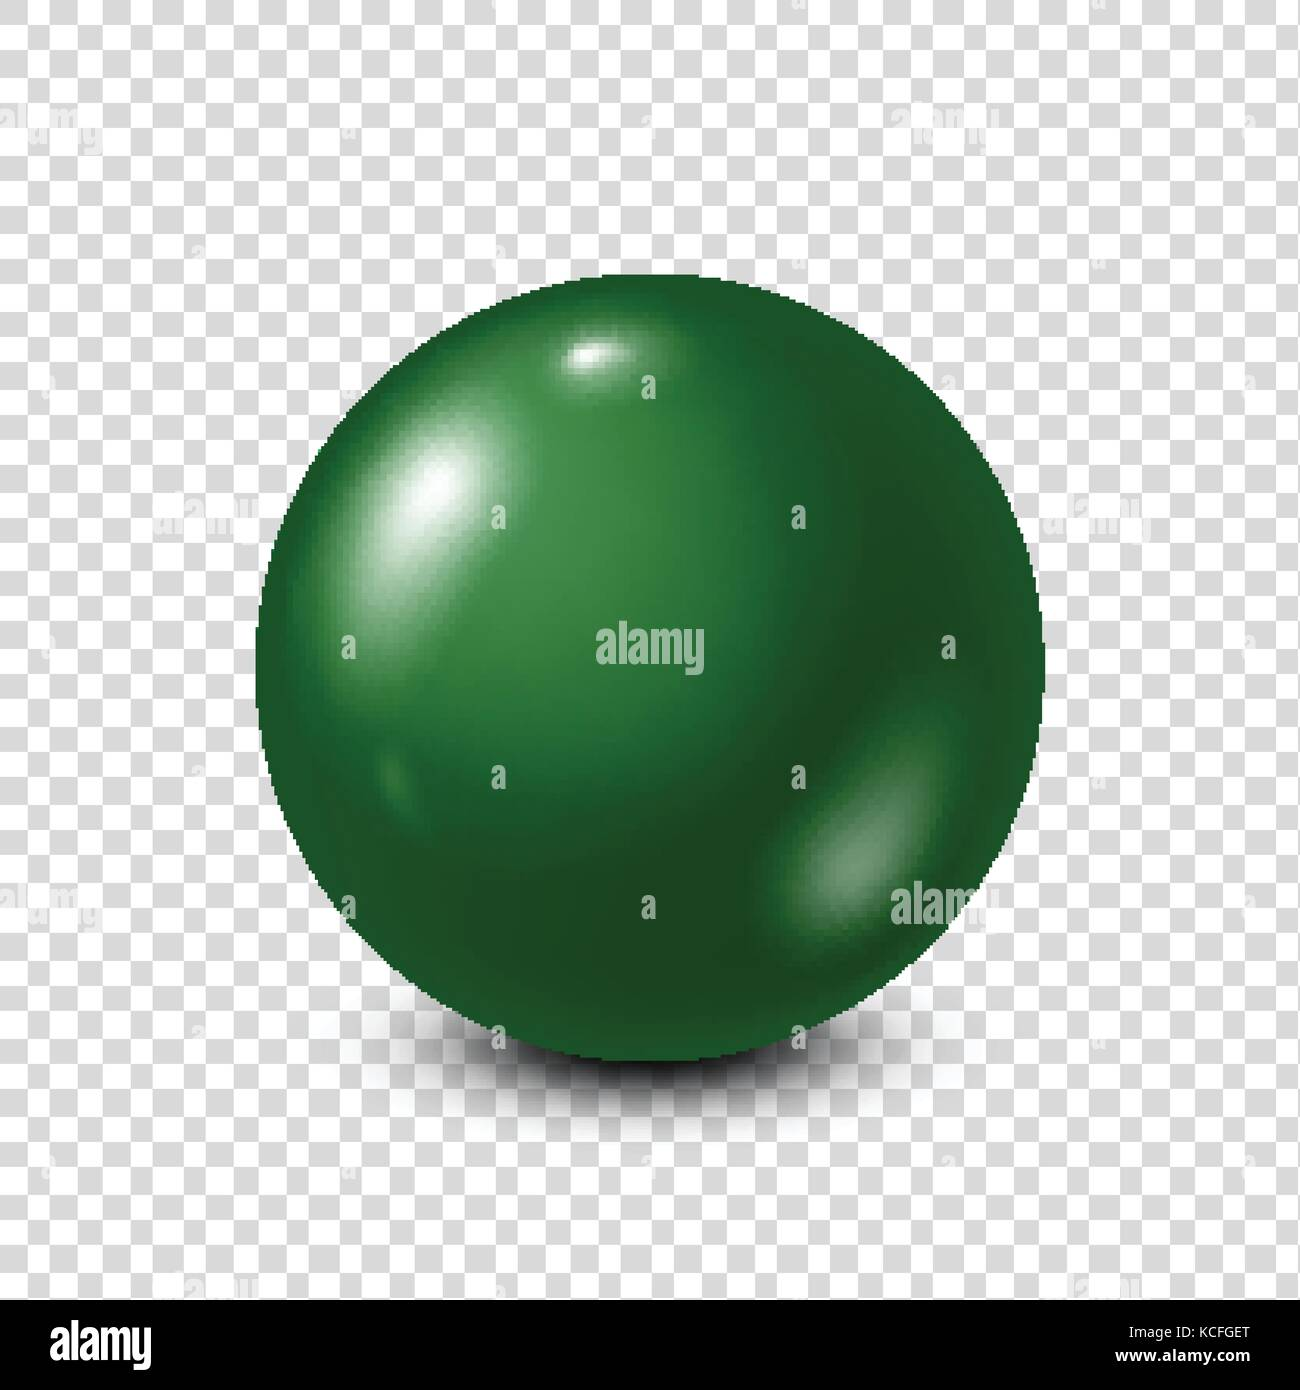 Green lottery, billiard,pool ball. Snooker. Transparent background. Vector illustration. - Stock Vector